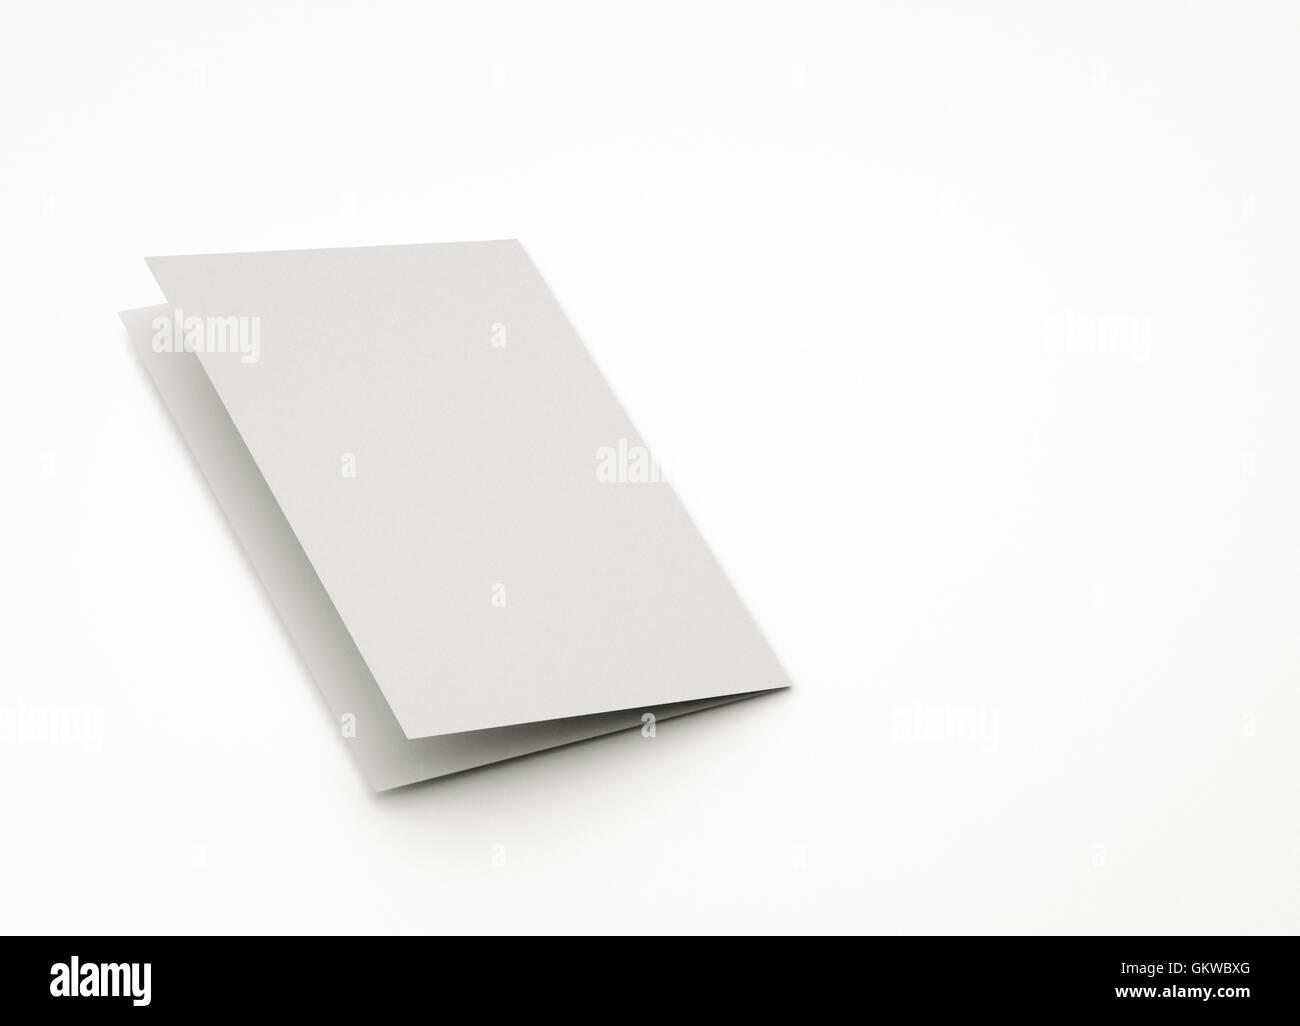 Groß Leere Farbseite Ideen - Framing Malvorlagen - thehomeloansinfo.info